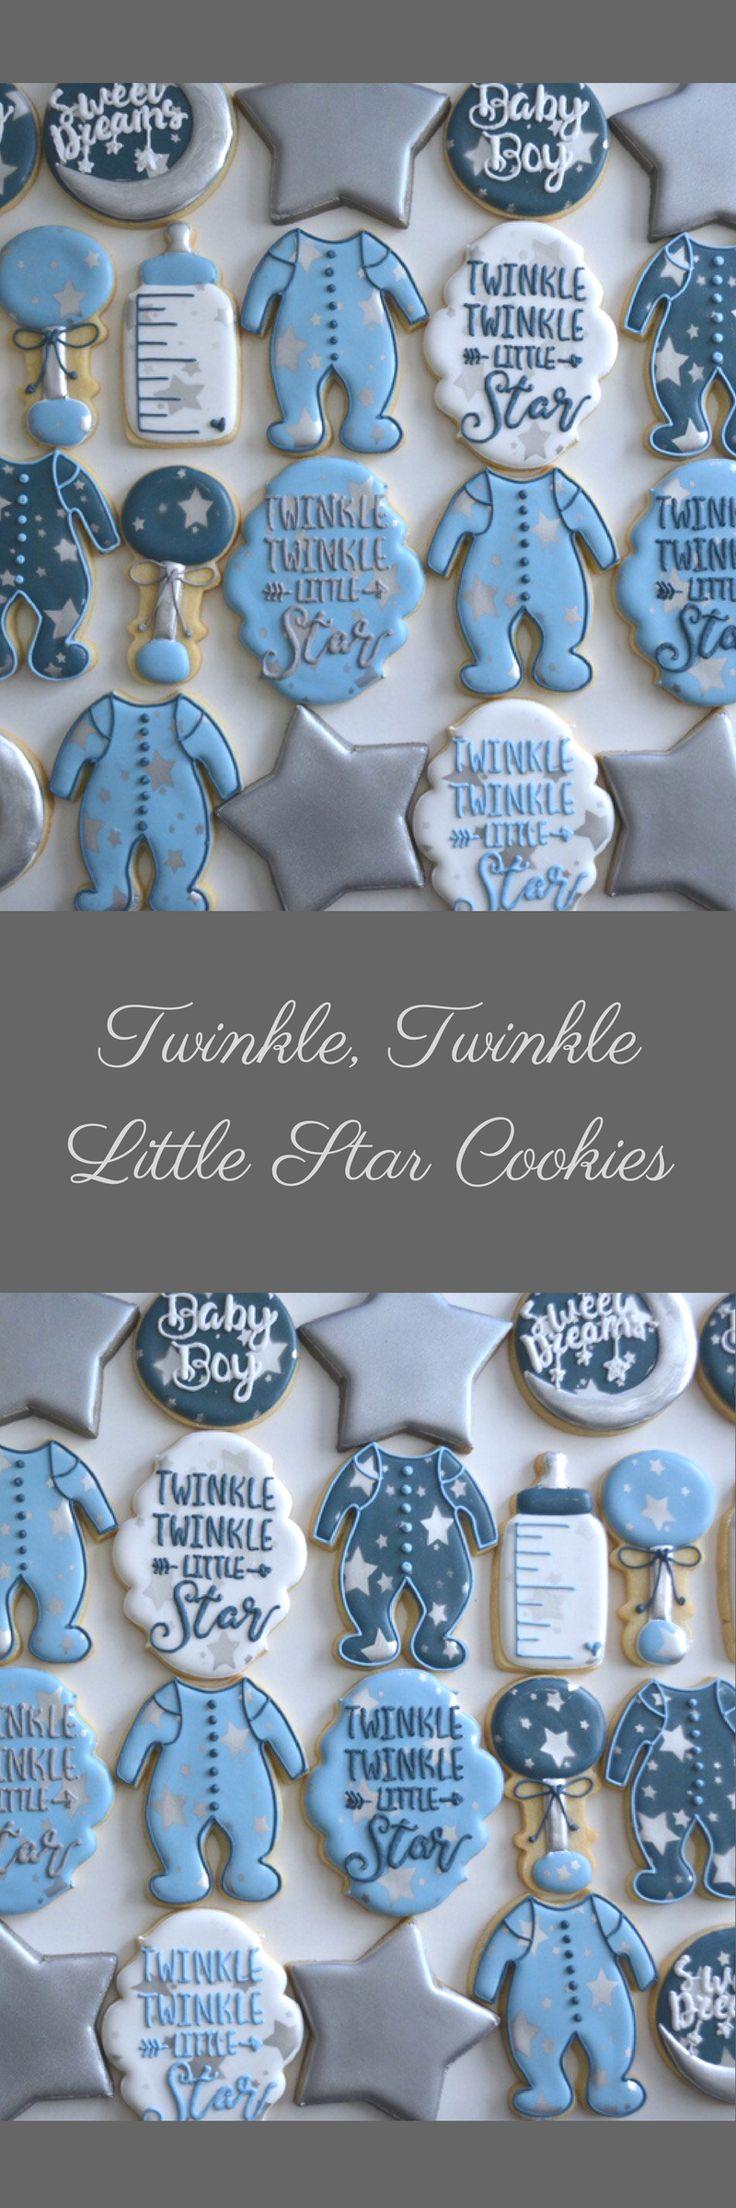 Two Dozen Twinkle, Twinkle Little Star Sugar Cookies Baby Shower Sugar Cookies #affiliate